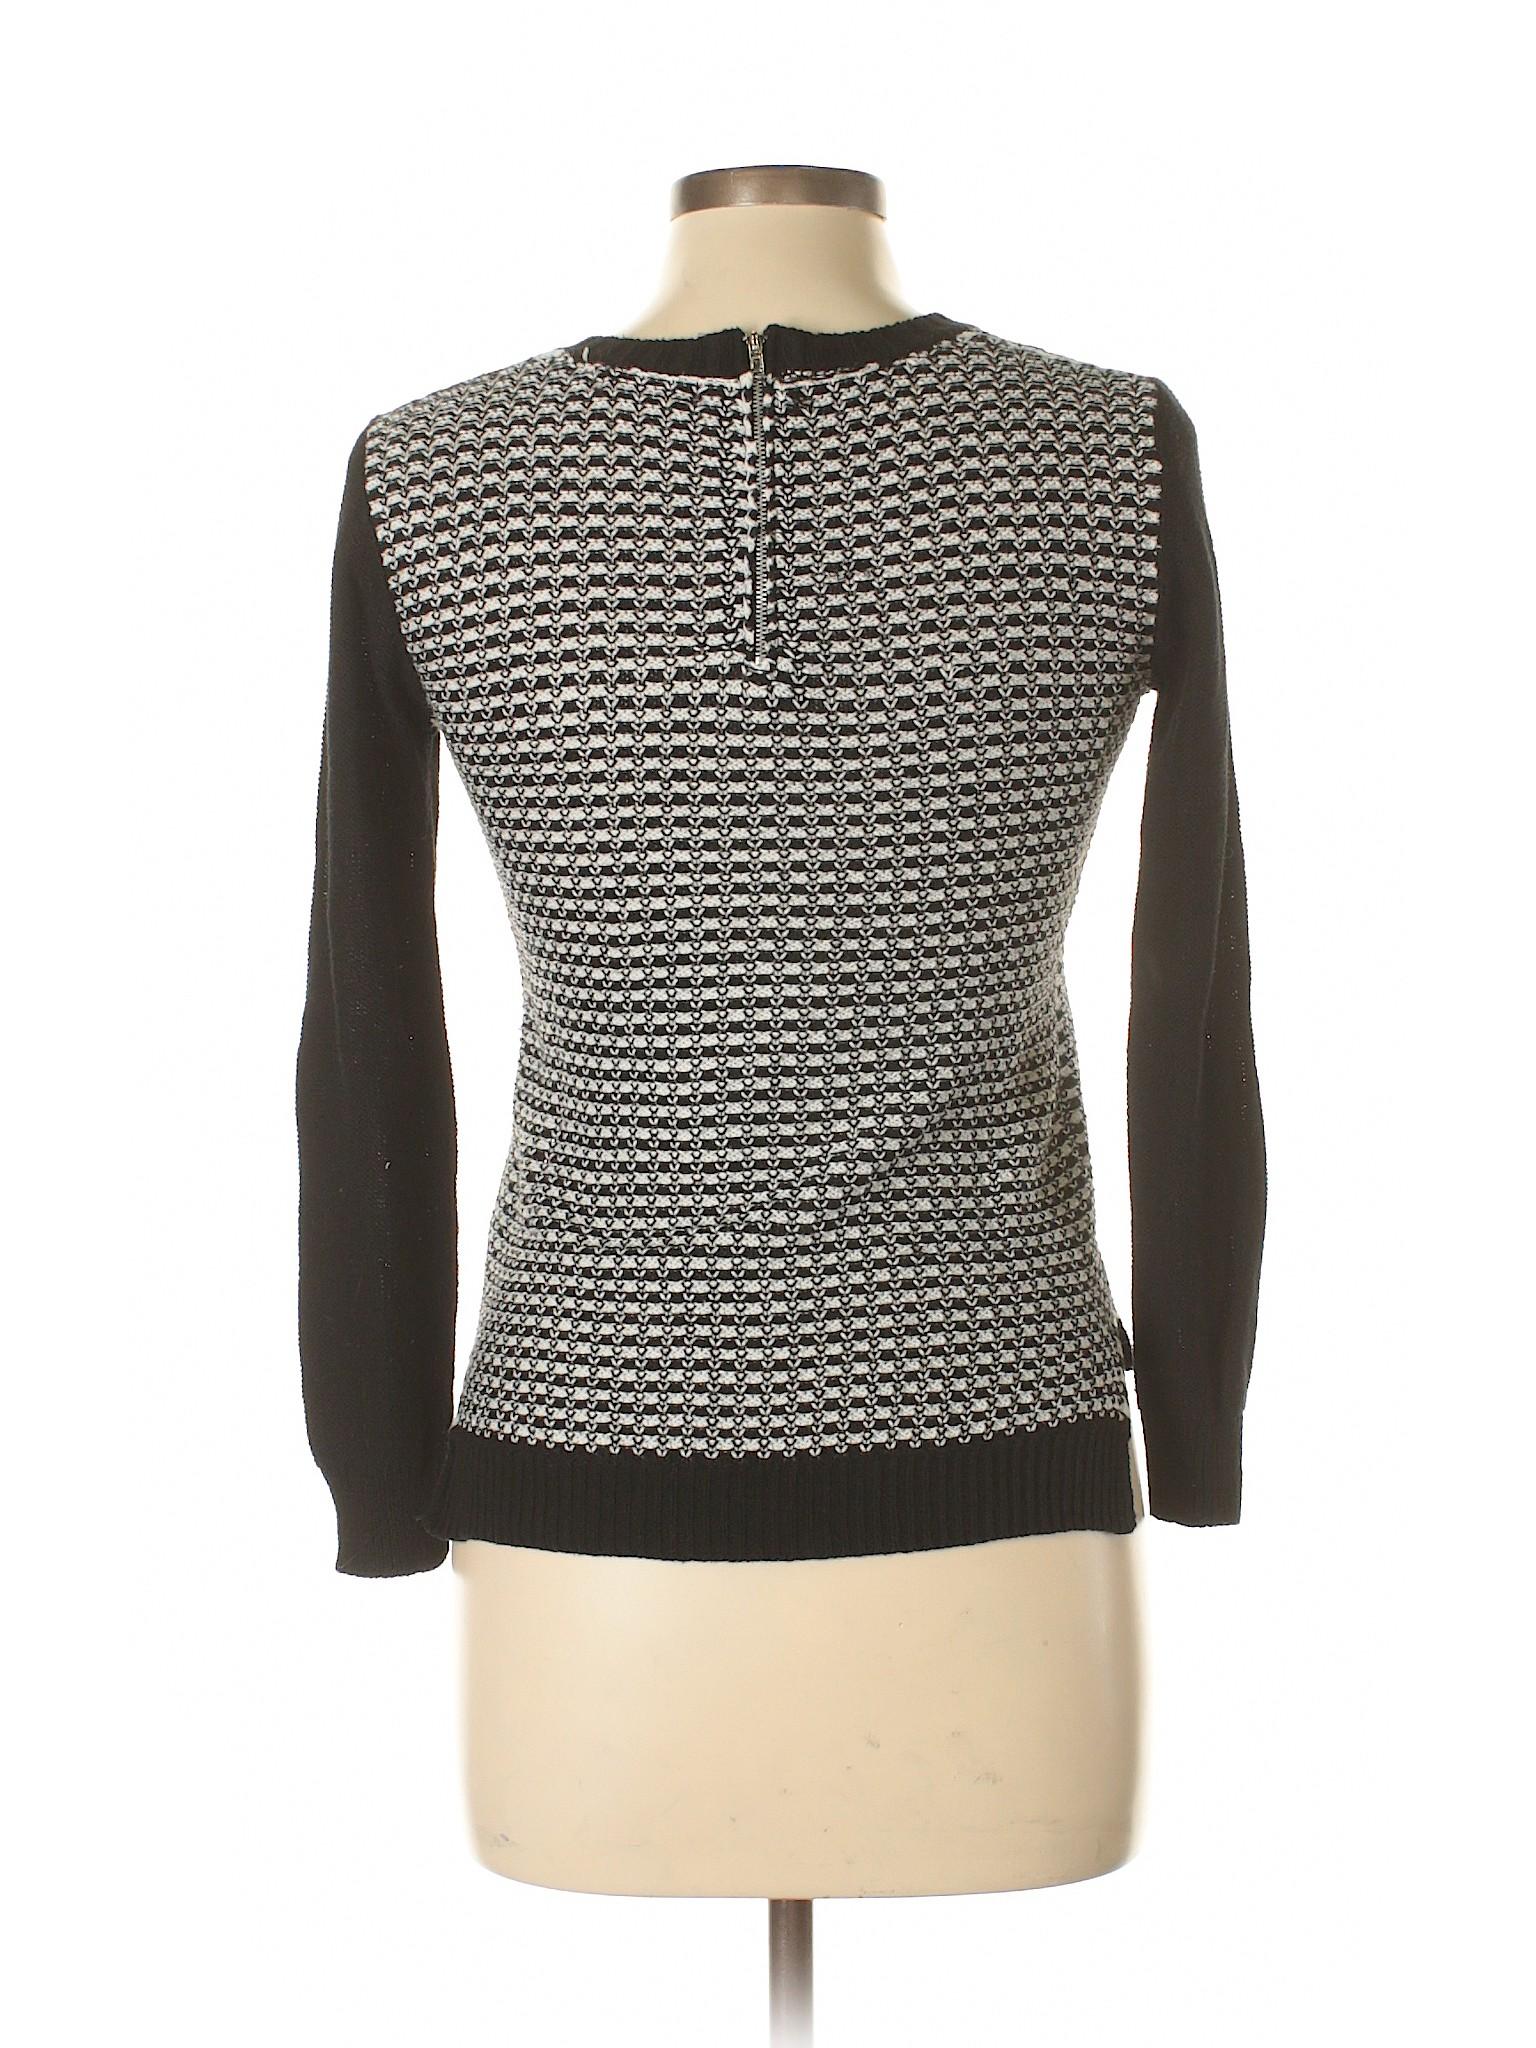 Pullover Boutique Sweater Aqua Aqua Boutique 6Fxwwq4